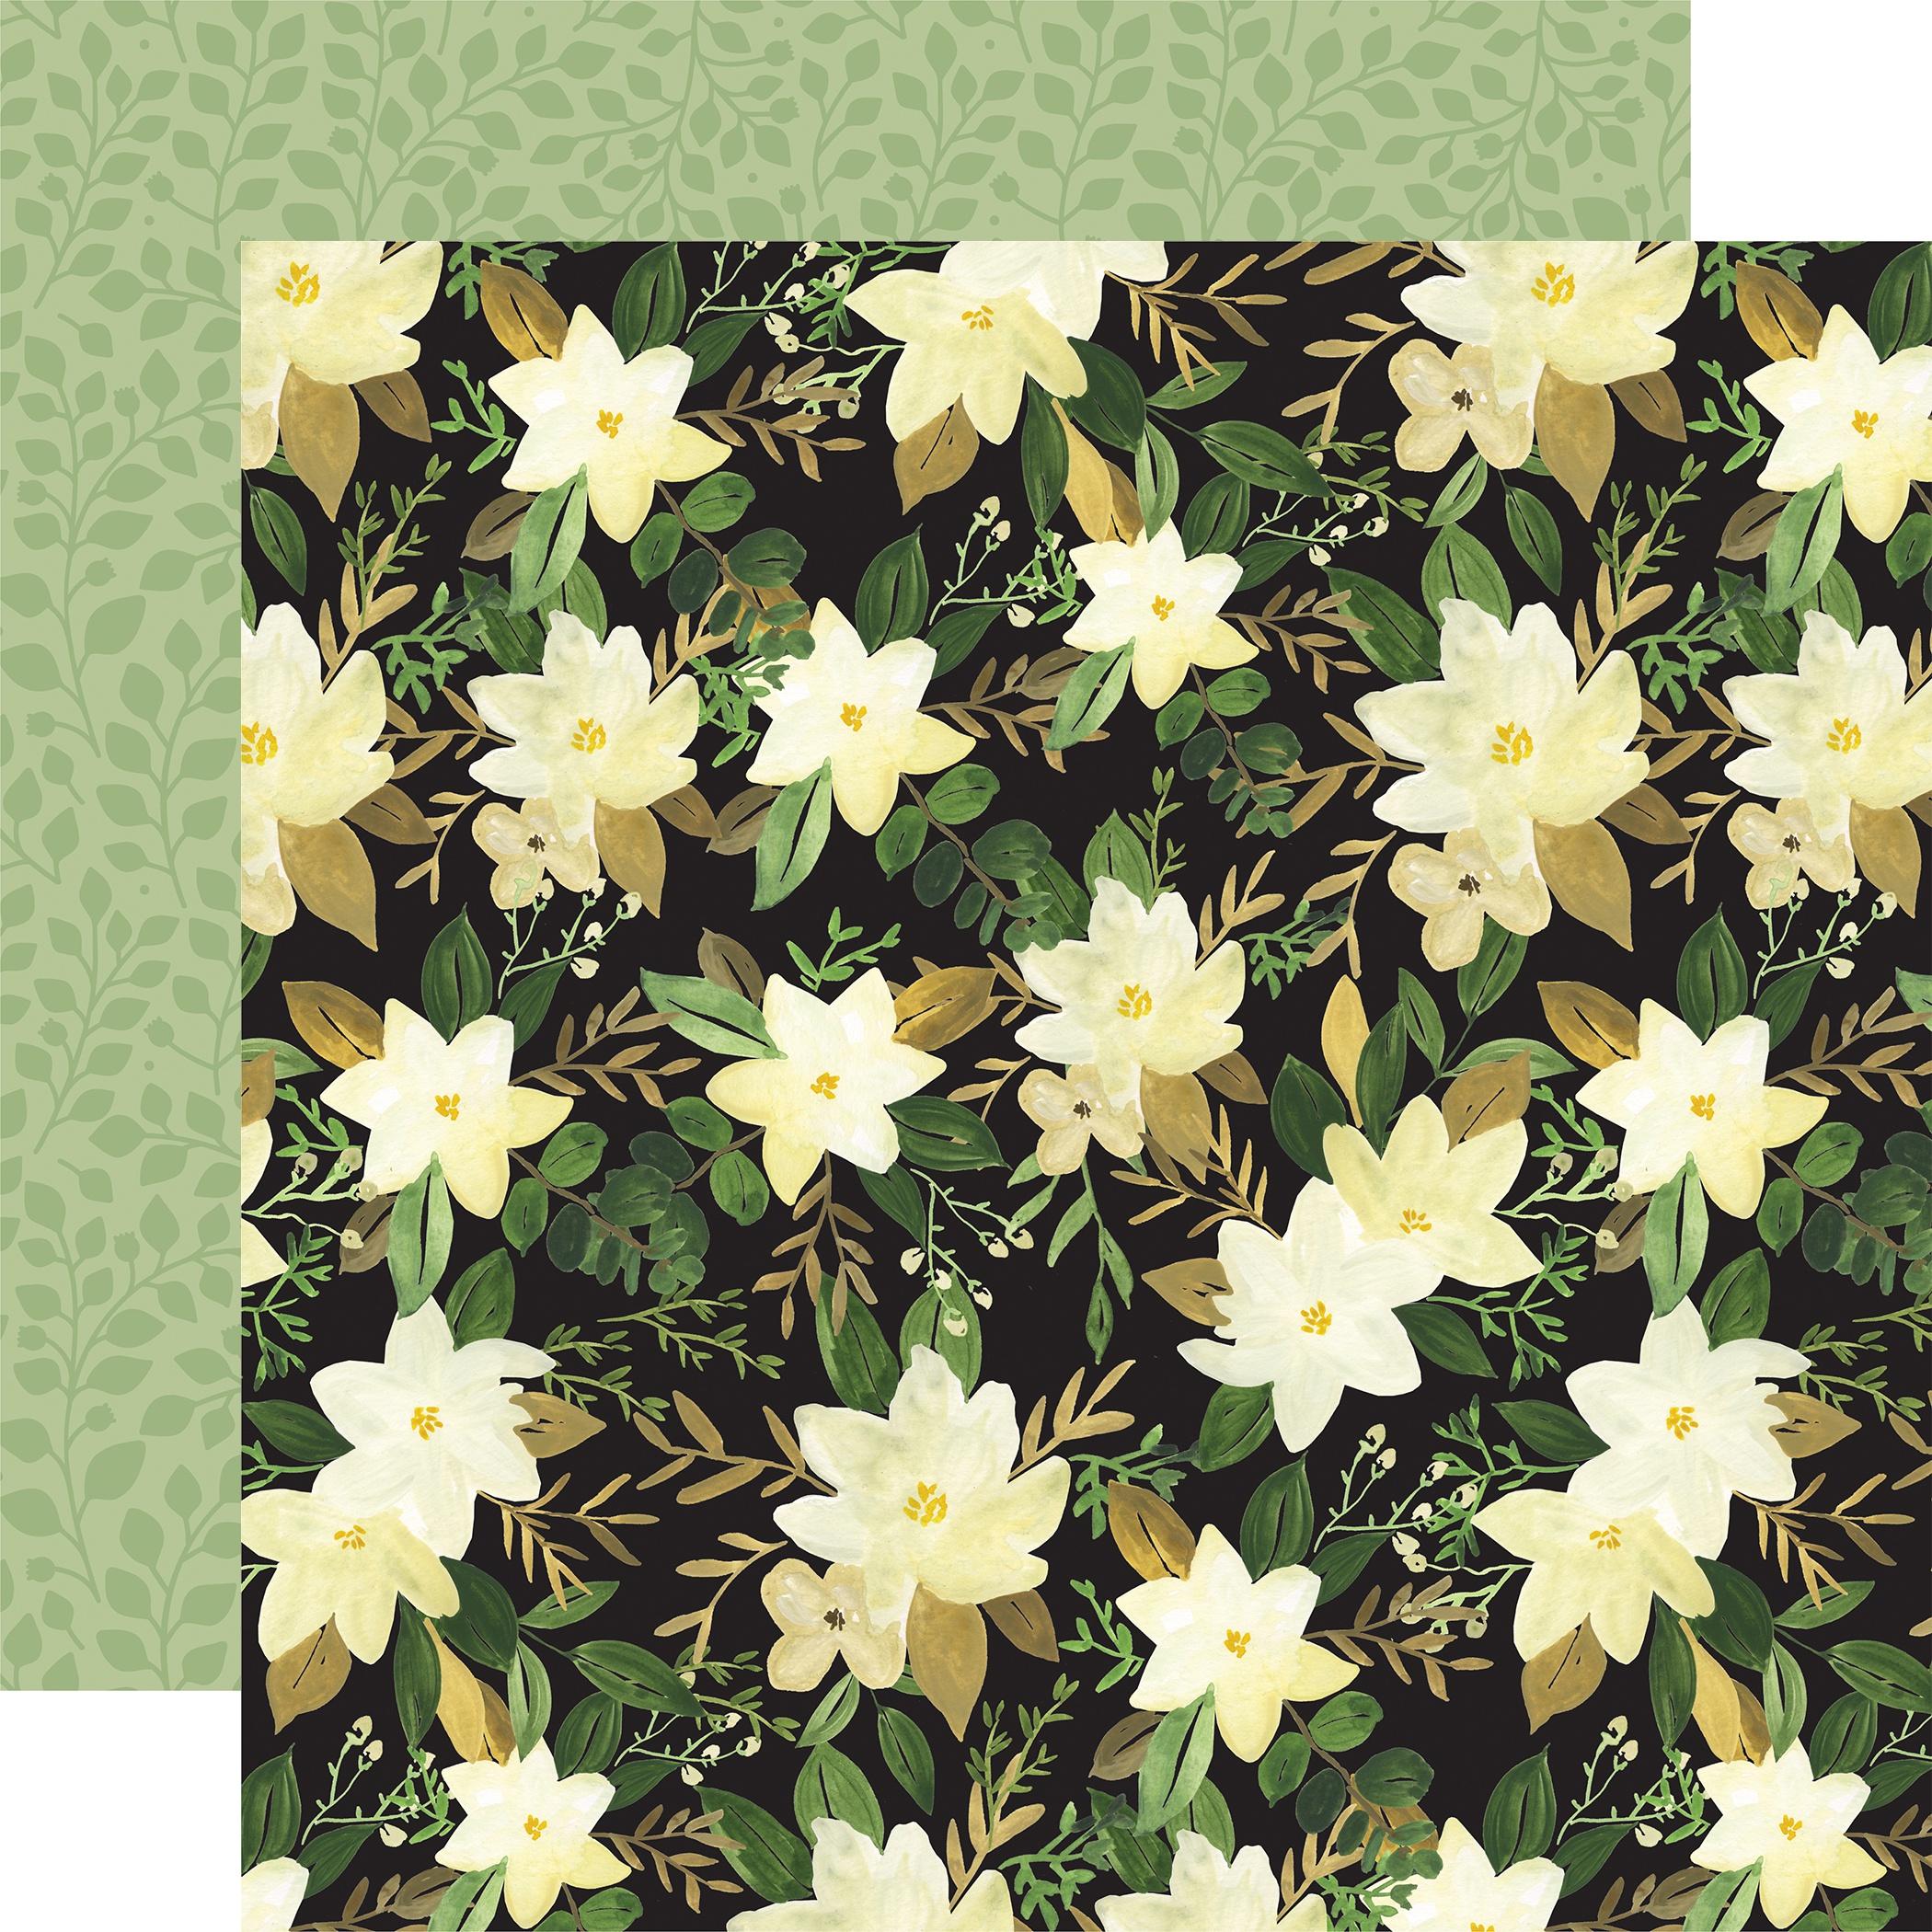 CB Flora #4 - Natural Large Floral